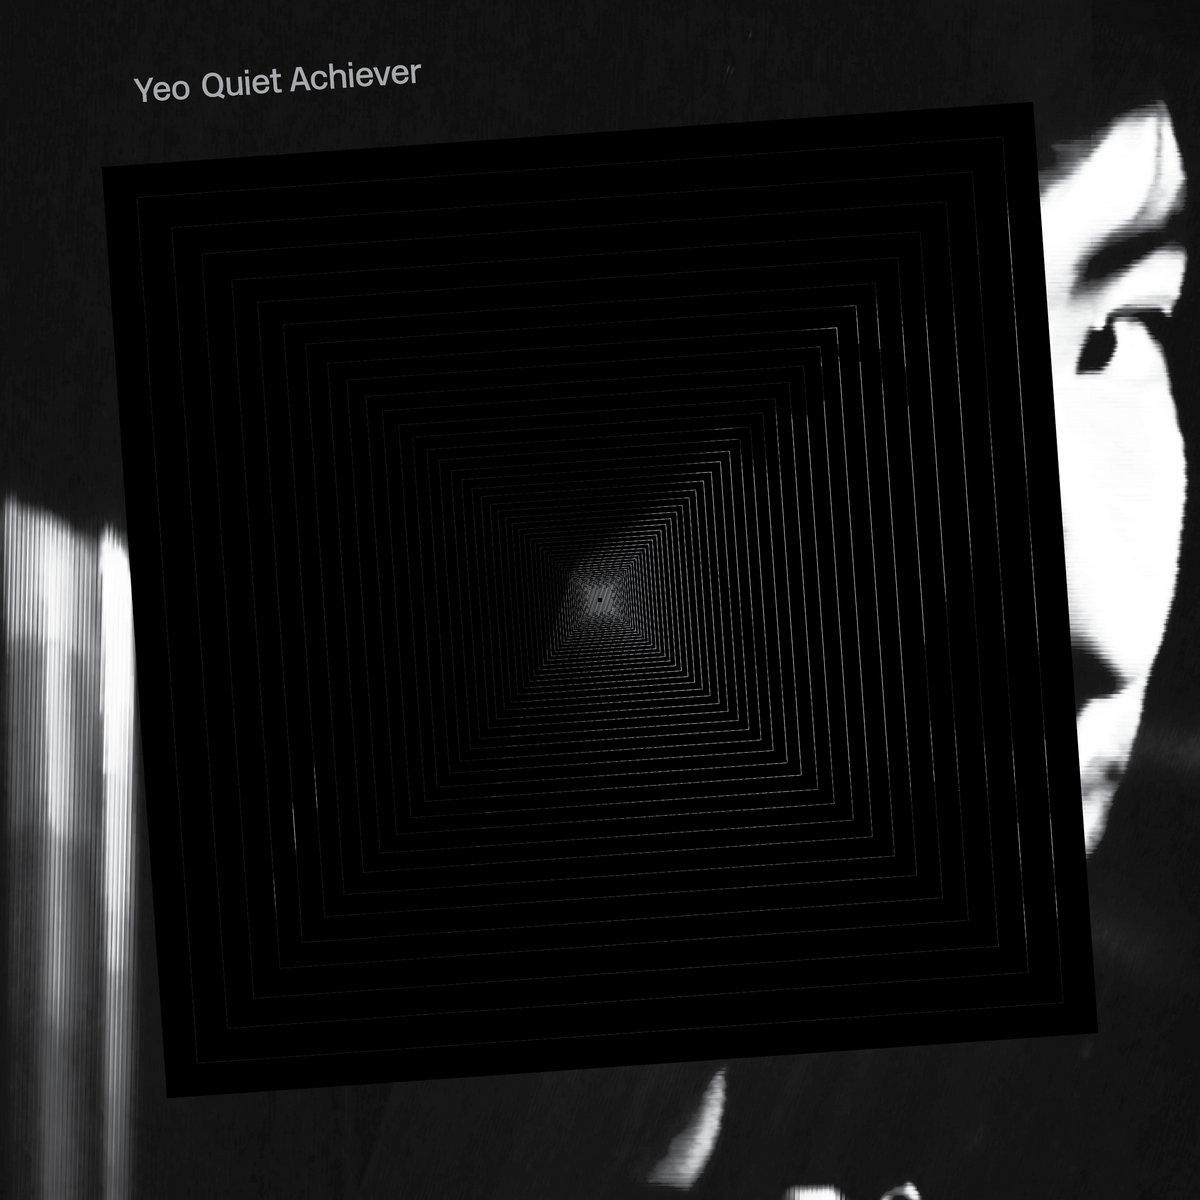 Quiet Achiever | Yeo